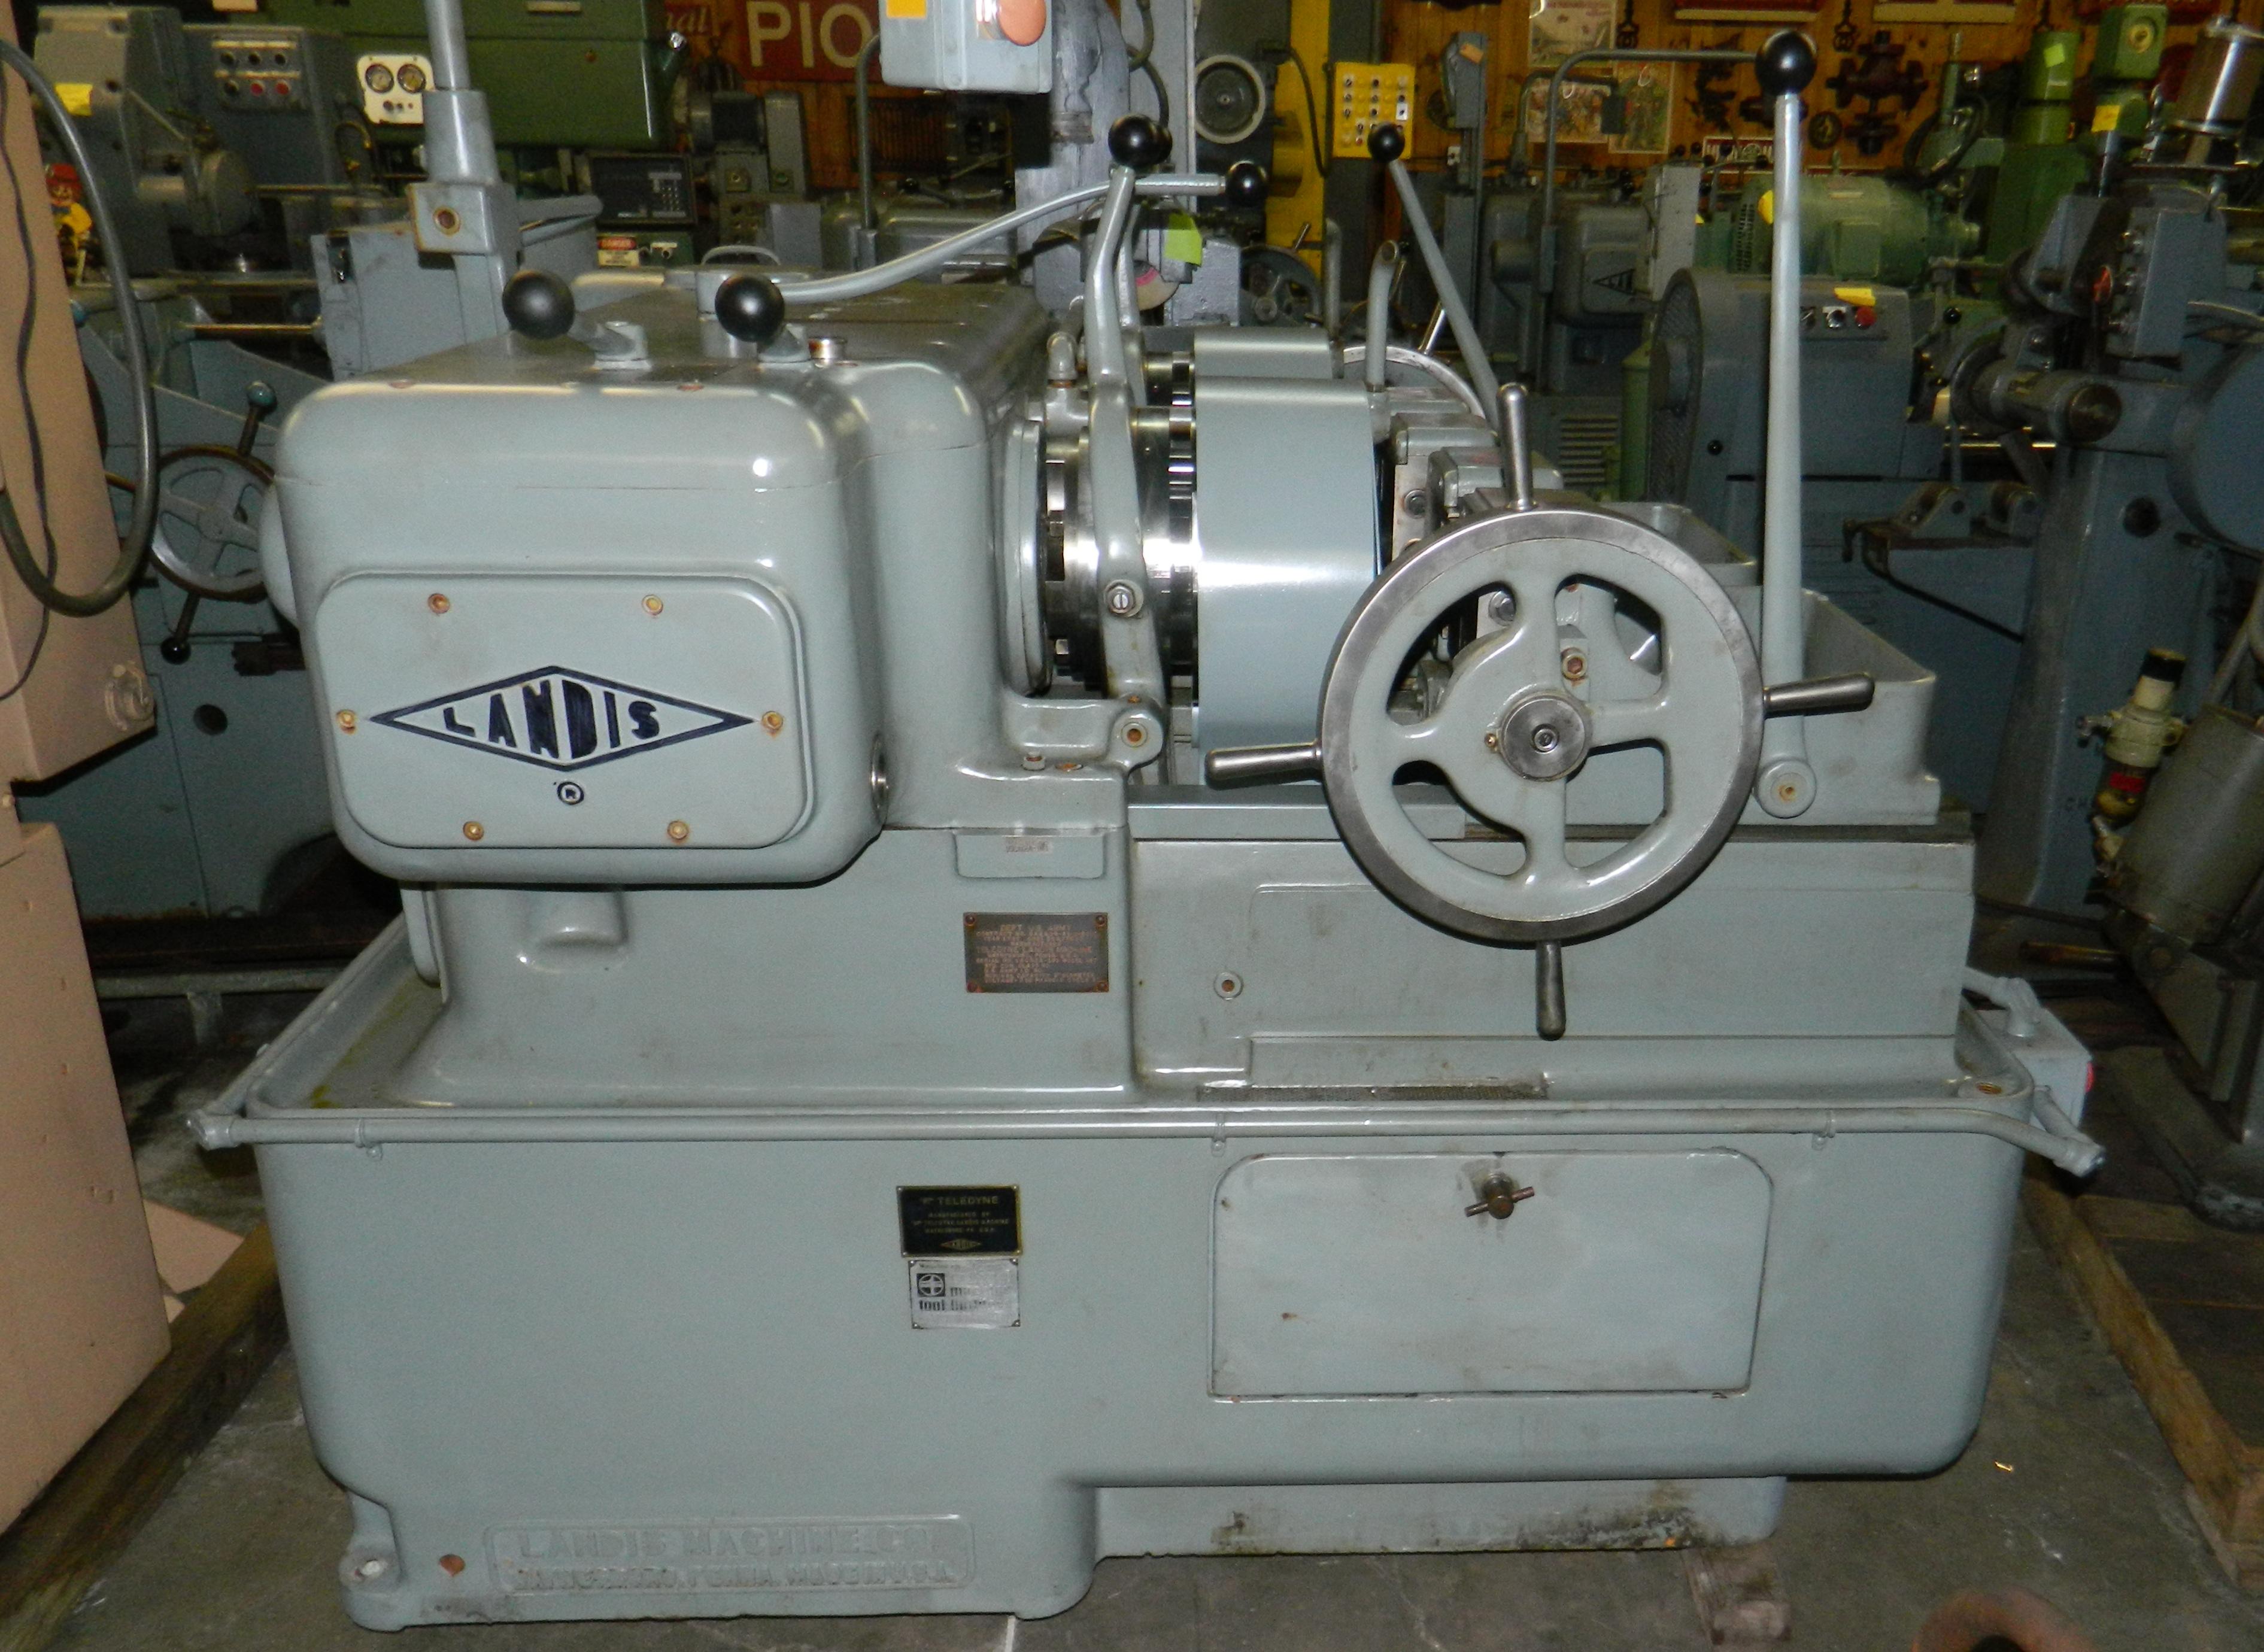 Landis Threading Machine For Sale